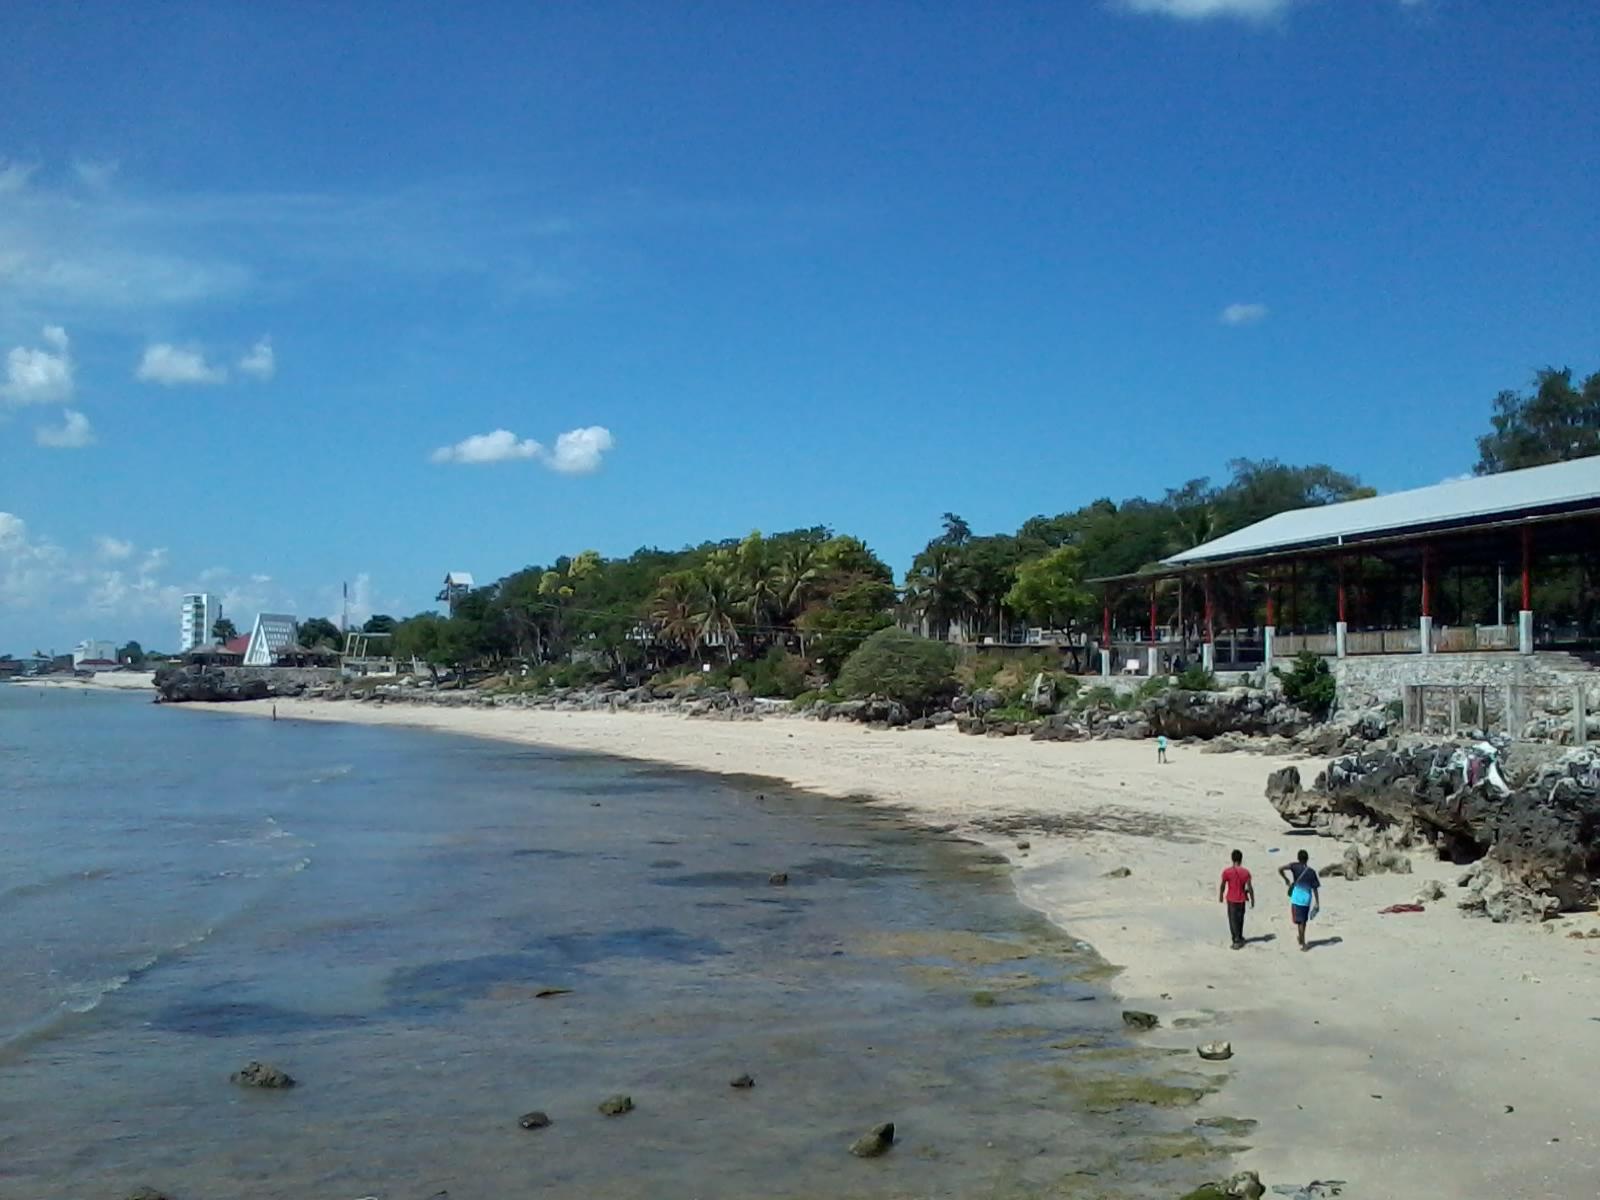 Pantai Pasir Panjang Kota Kupang Ntt Haidi Barasa 2014 05